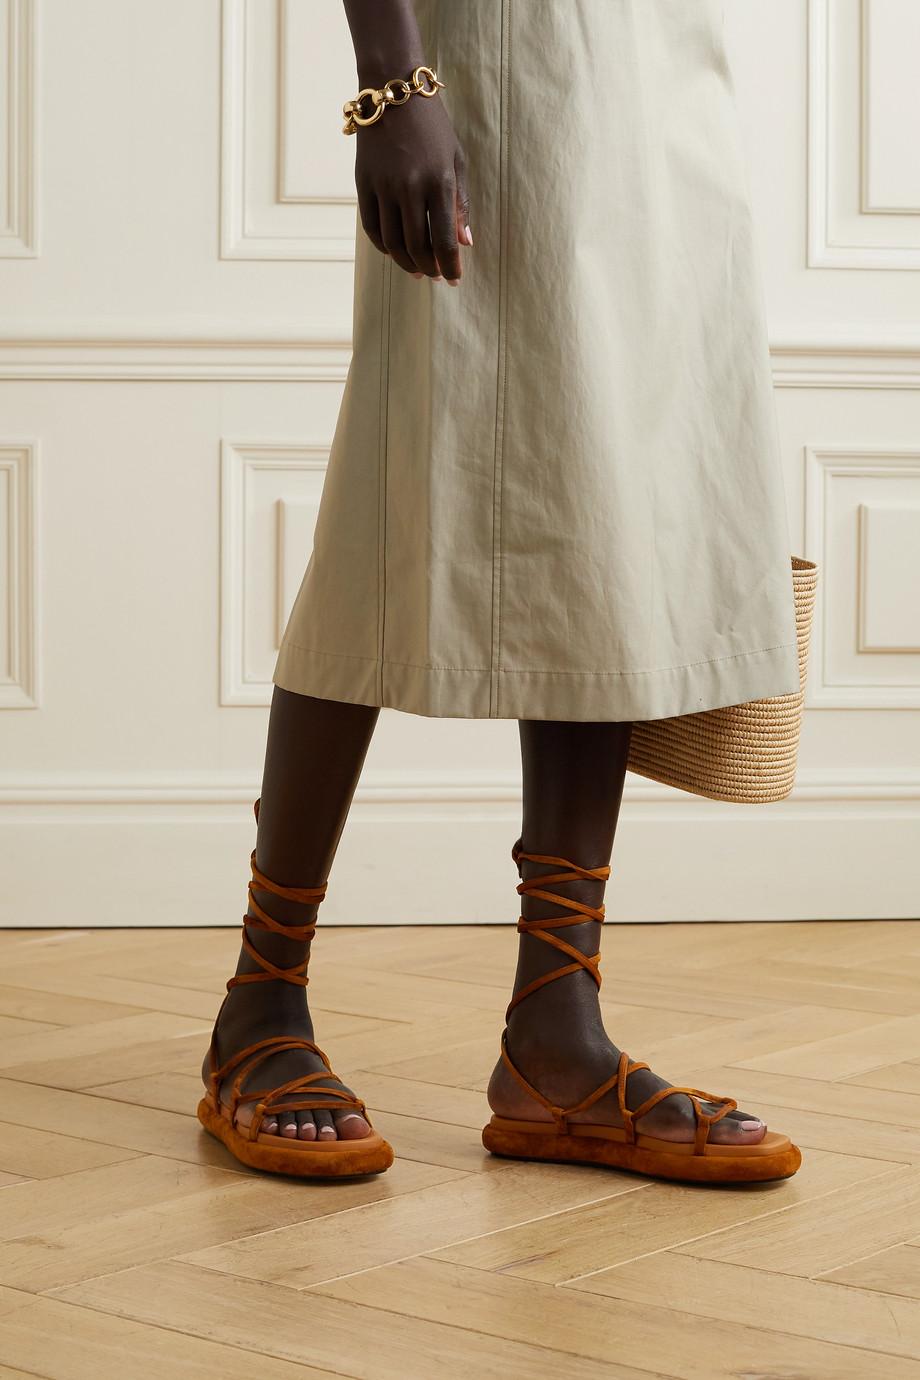 Khaite Alba leather-trimmed suede sandals